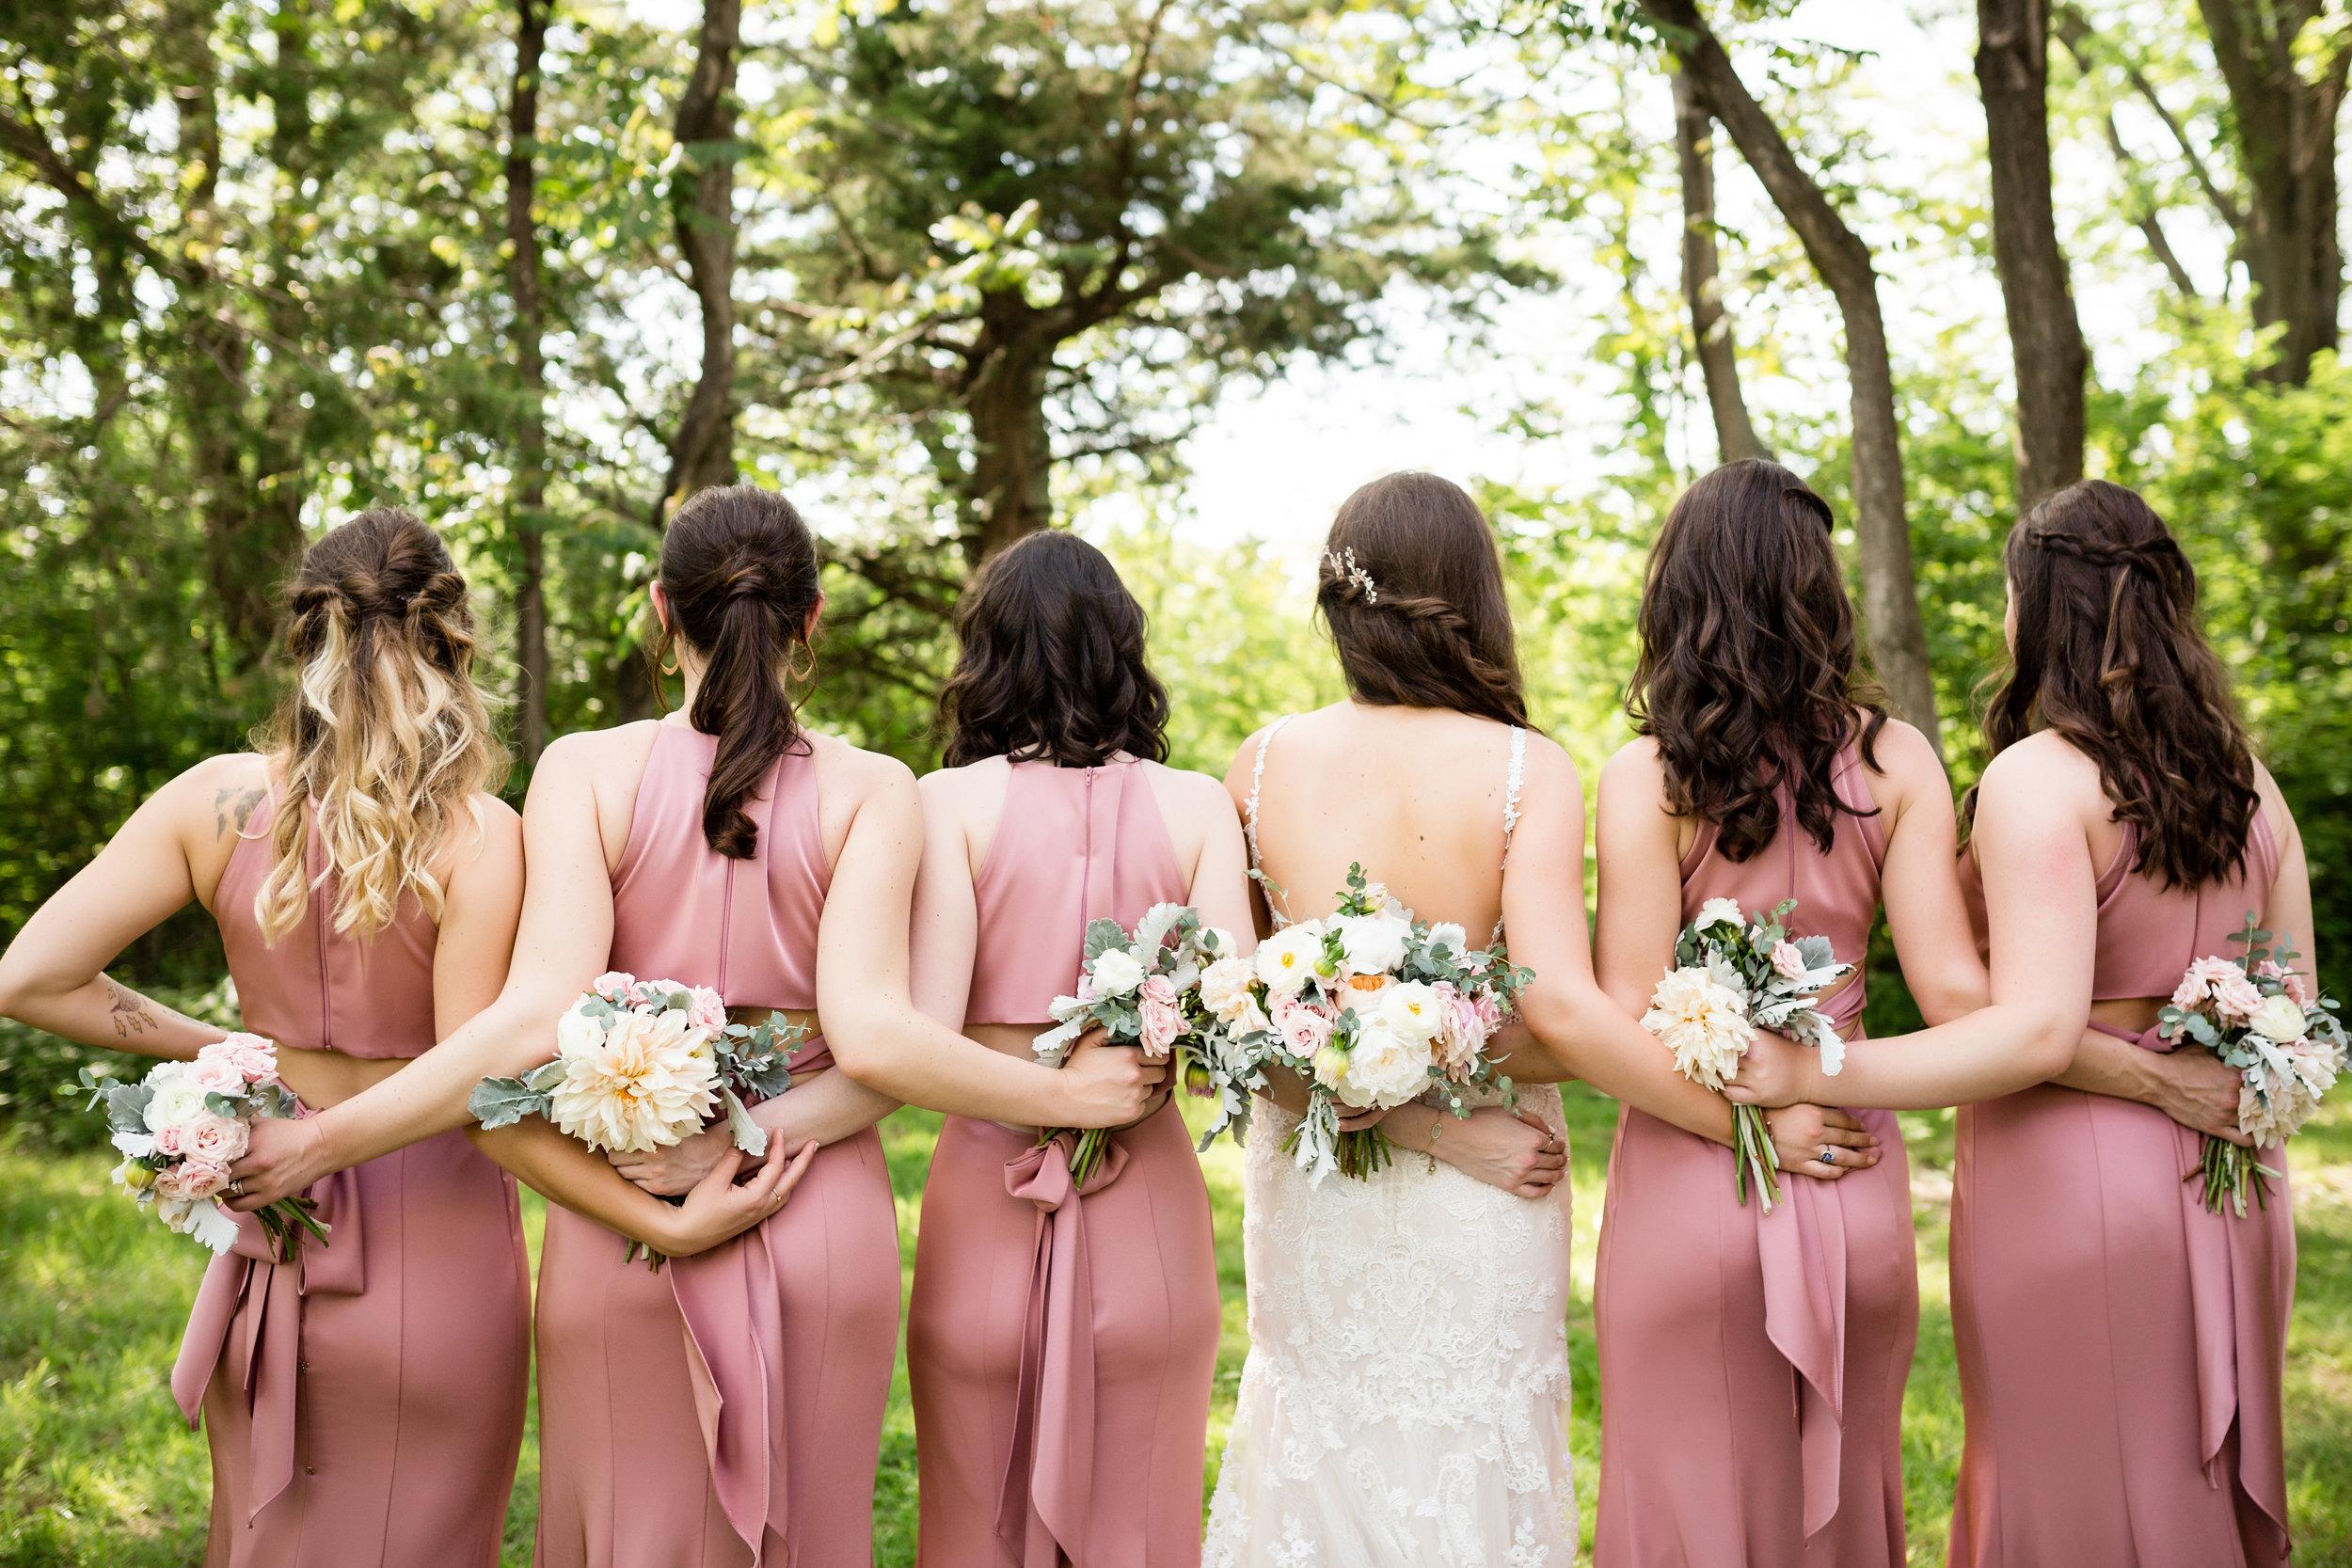 brielle-davis-events-kairos-photography-chandler-hill-wedding-278.jpg